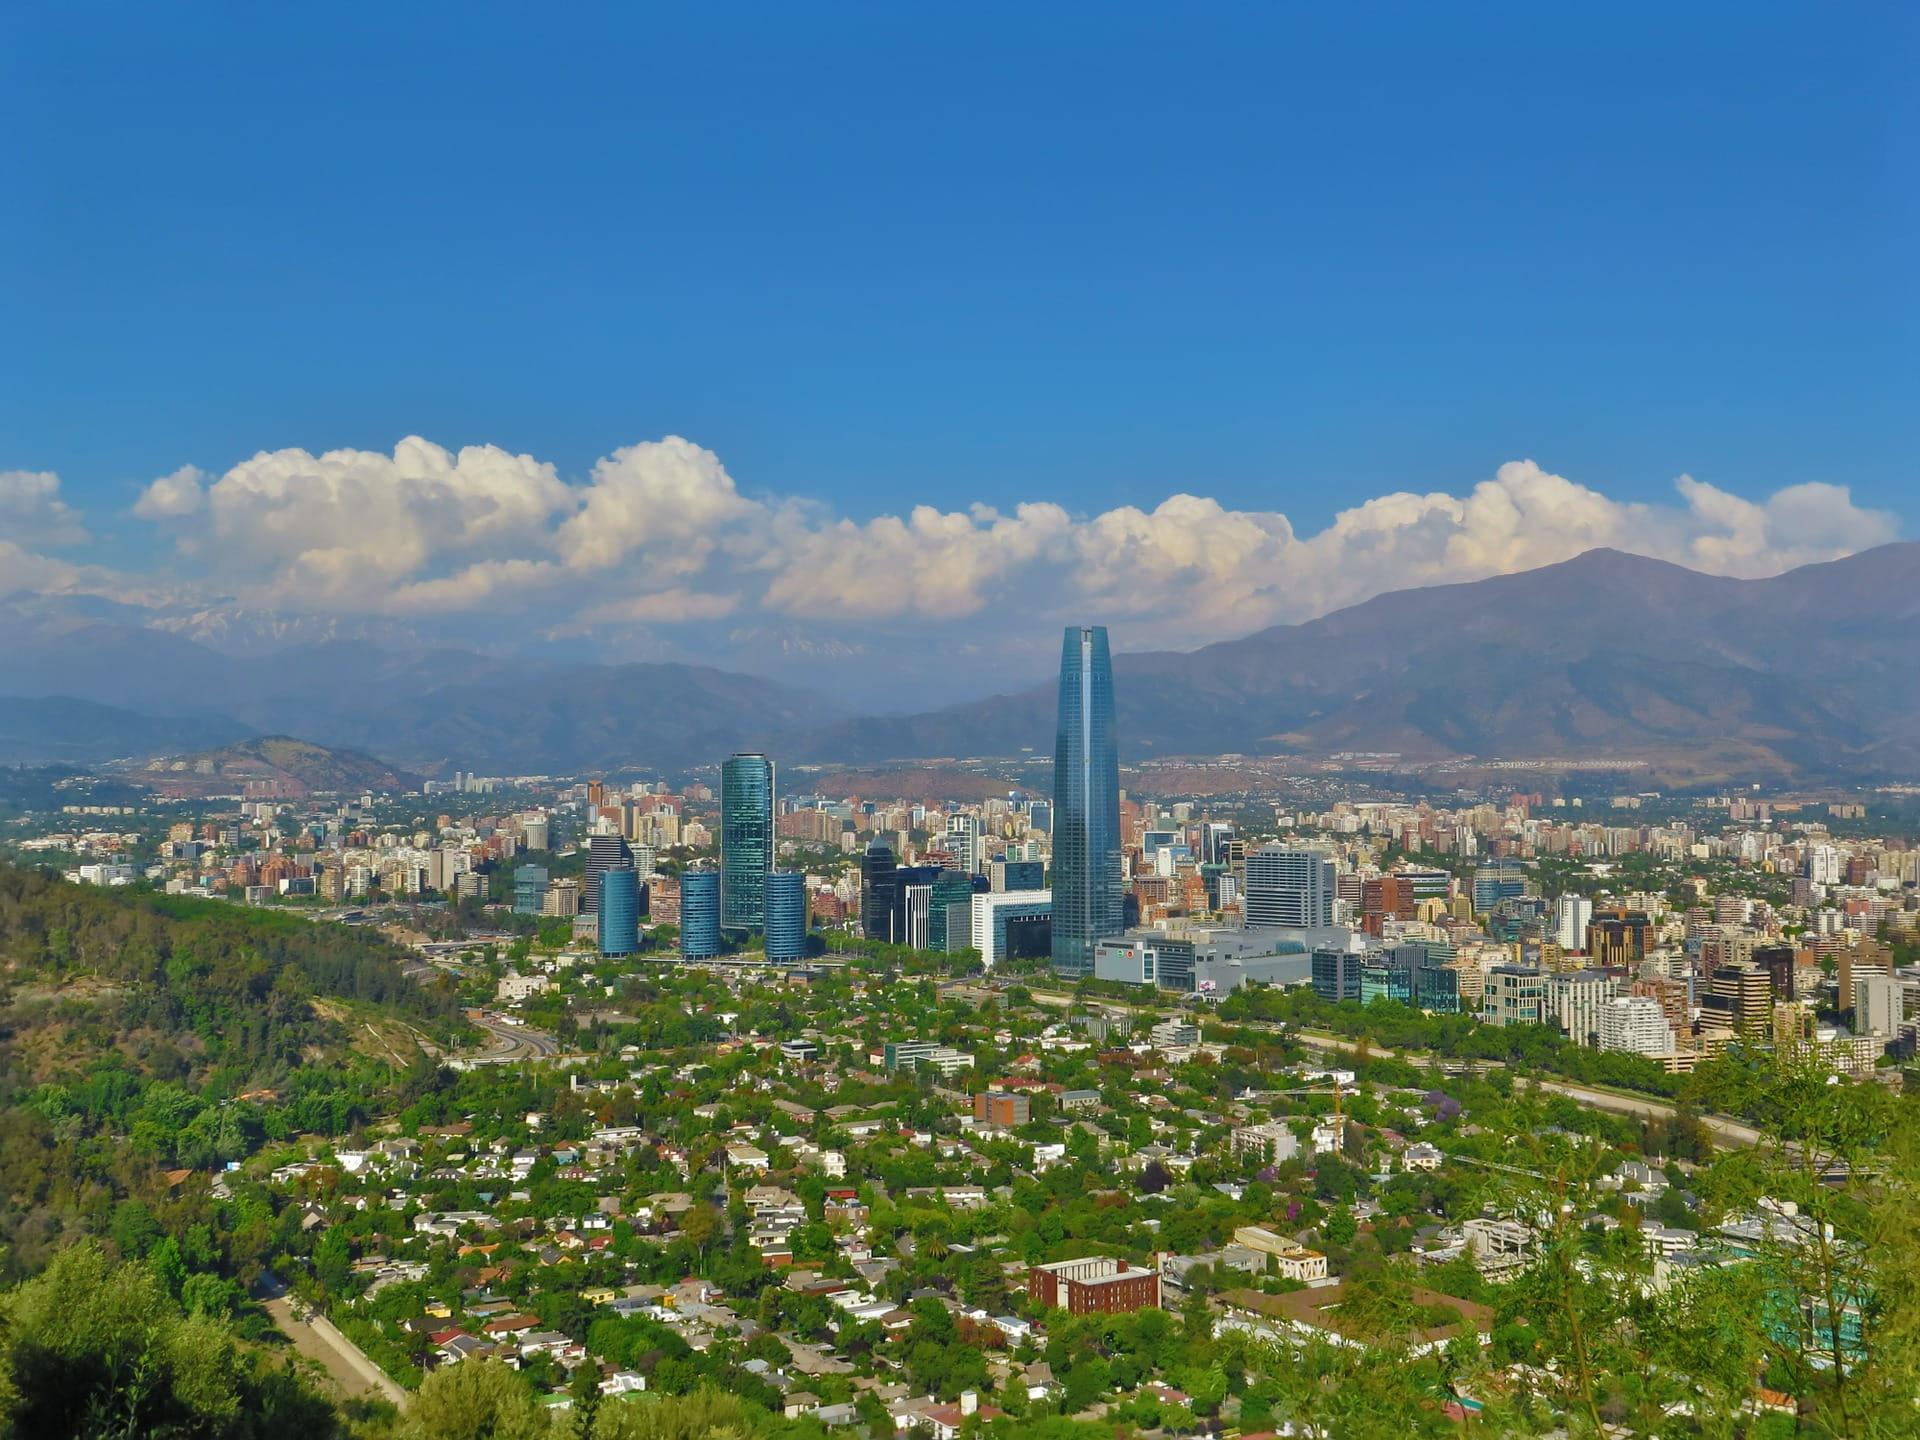 iProspect - Santiago, Chile